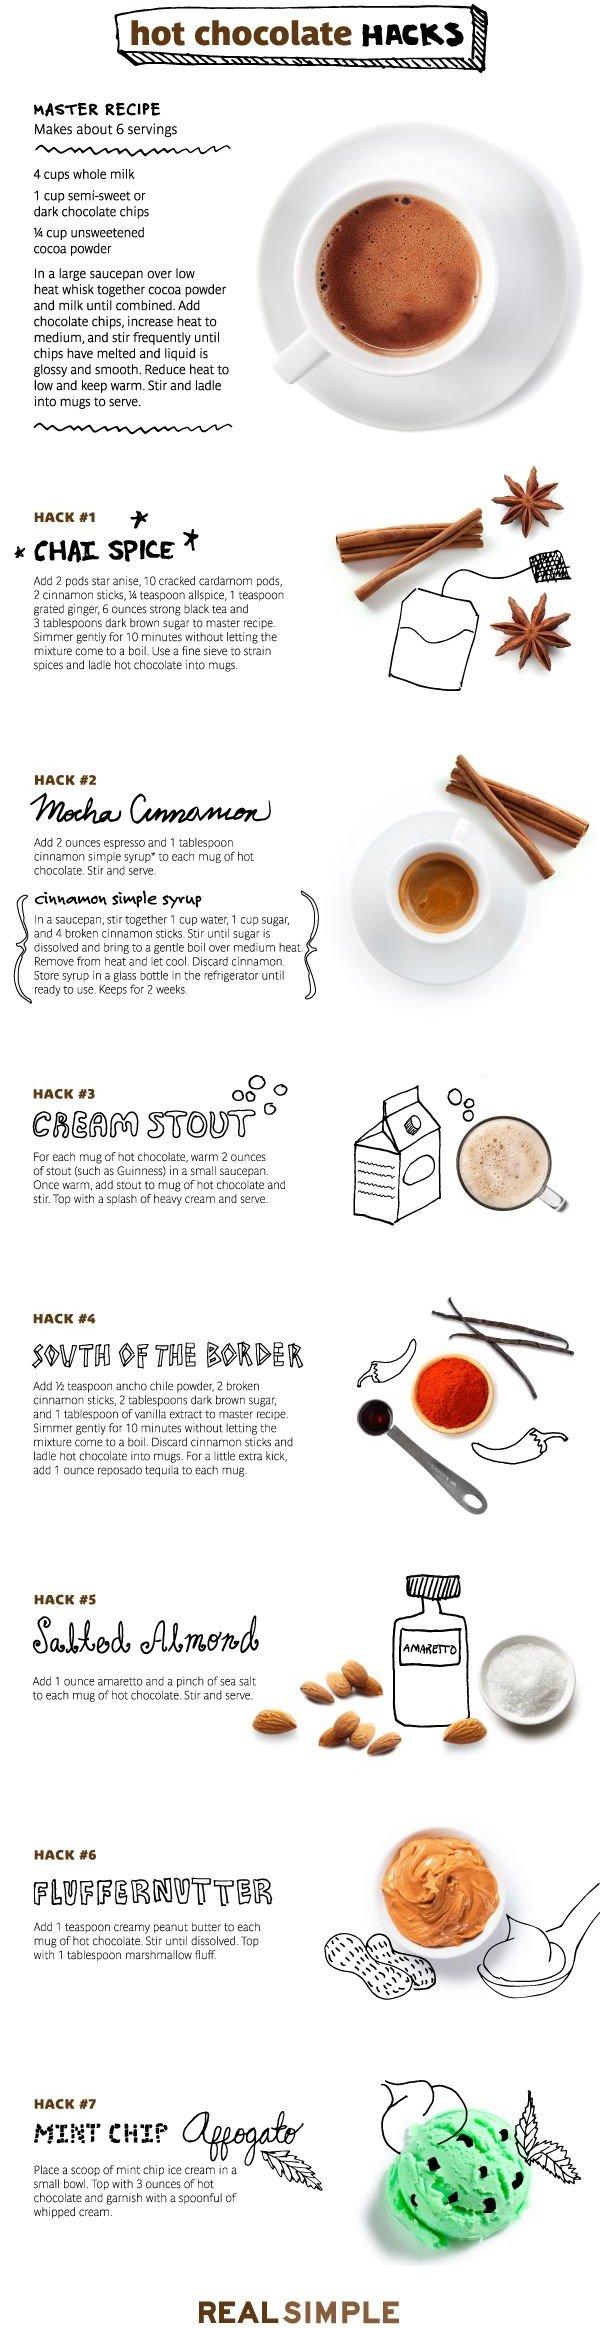 Hot Cocoa Hacks